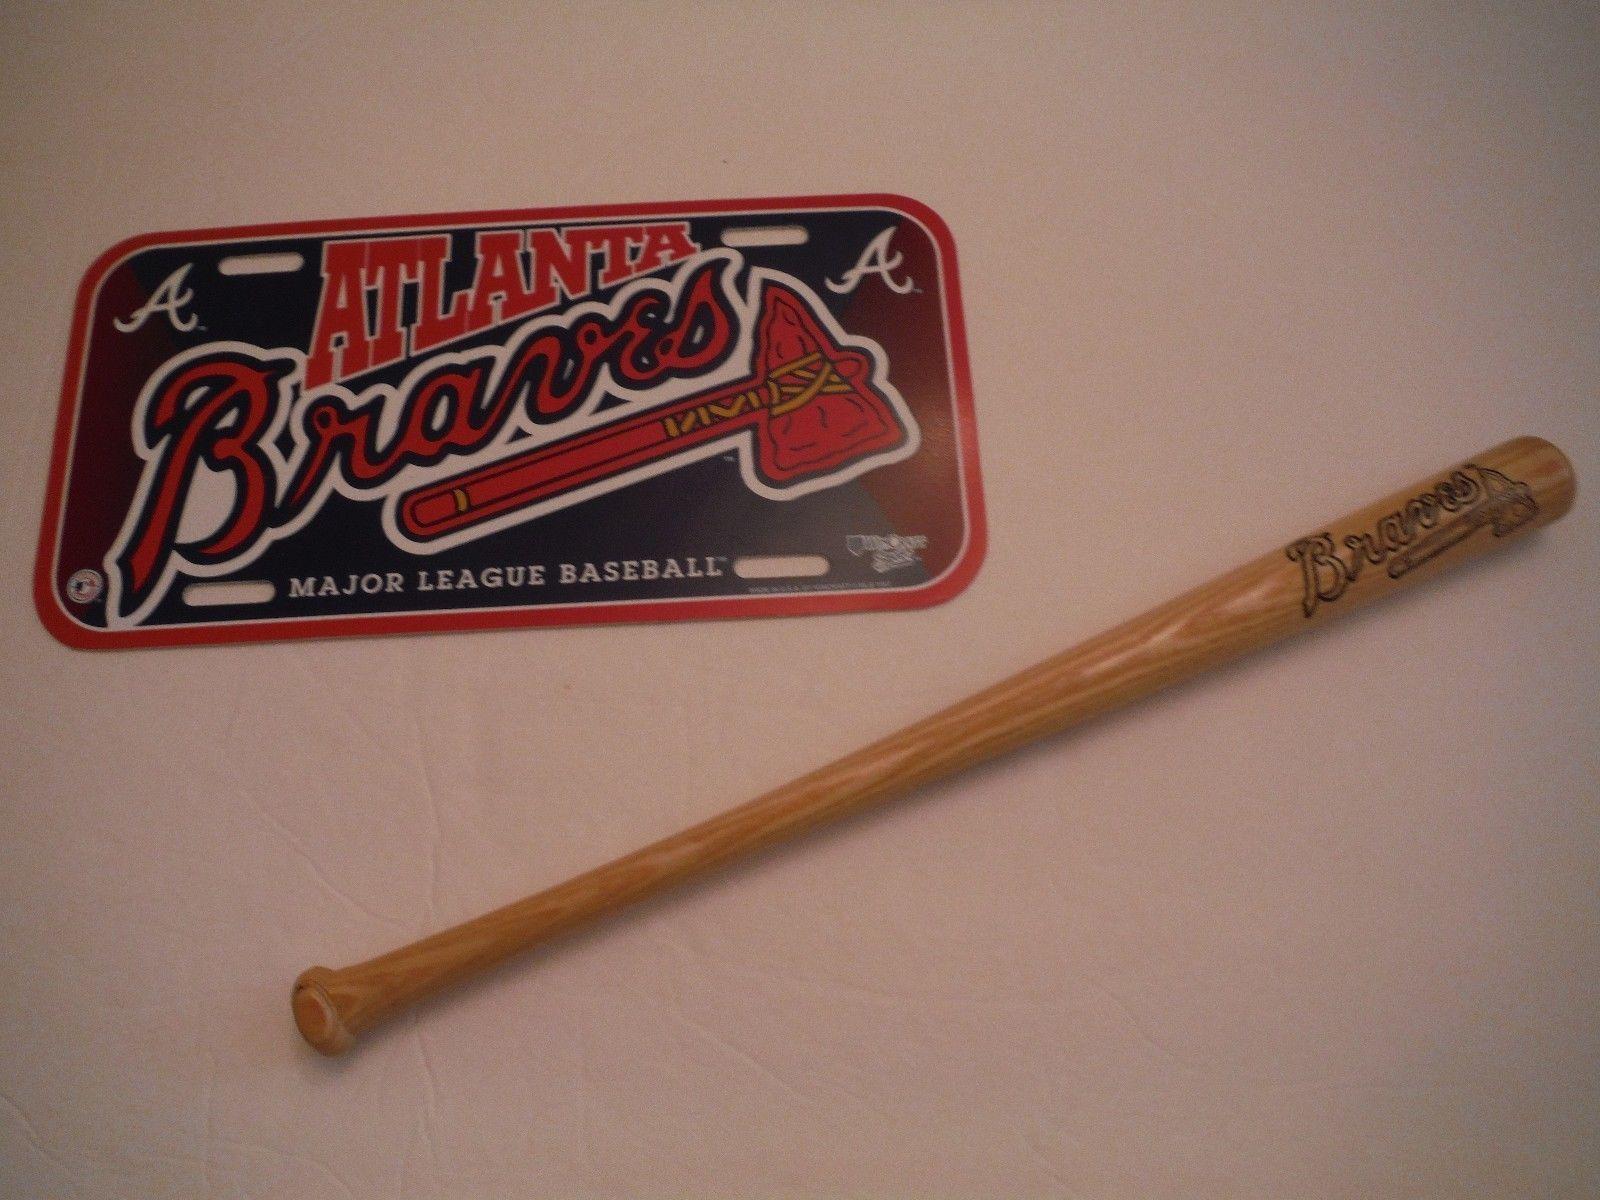 Atlanta Braves Souvenir Set Wsb Radio Network Mini Bat And Plastic License Plate Braves Major League Baseball Atlanta Braves